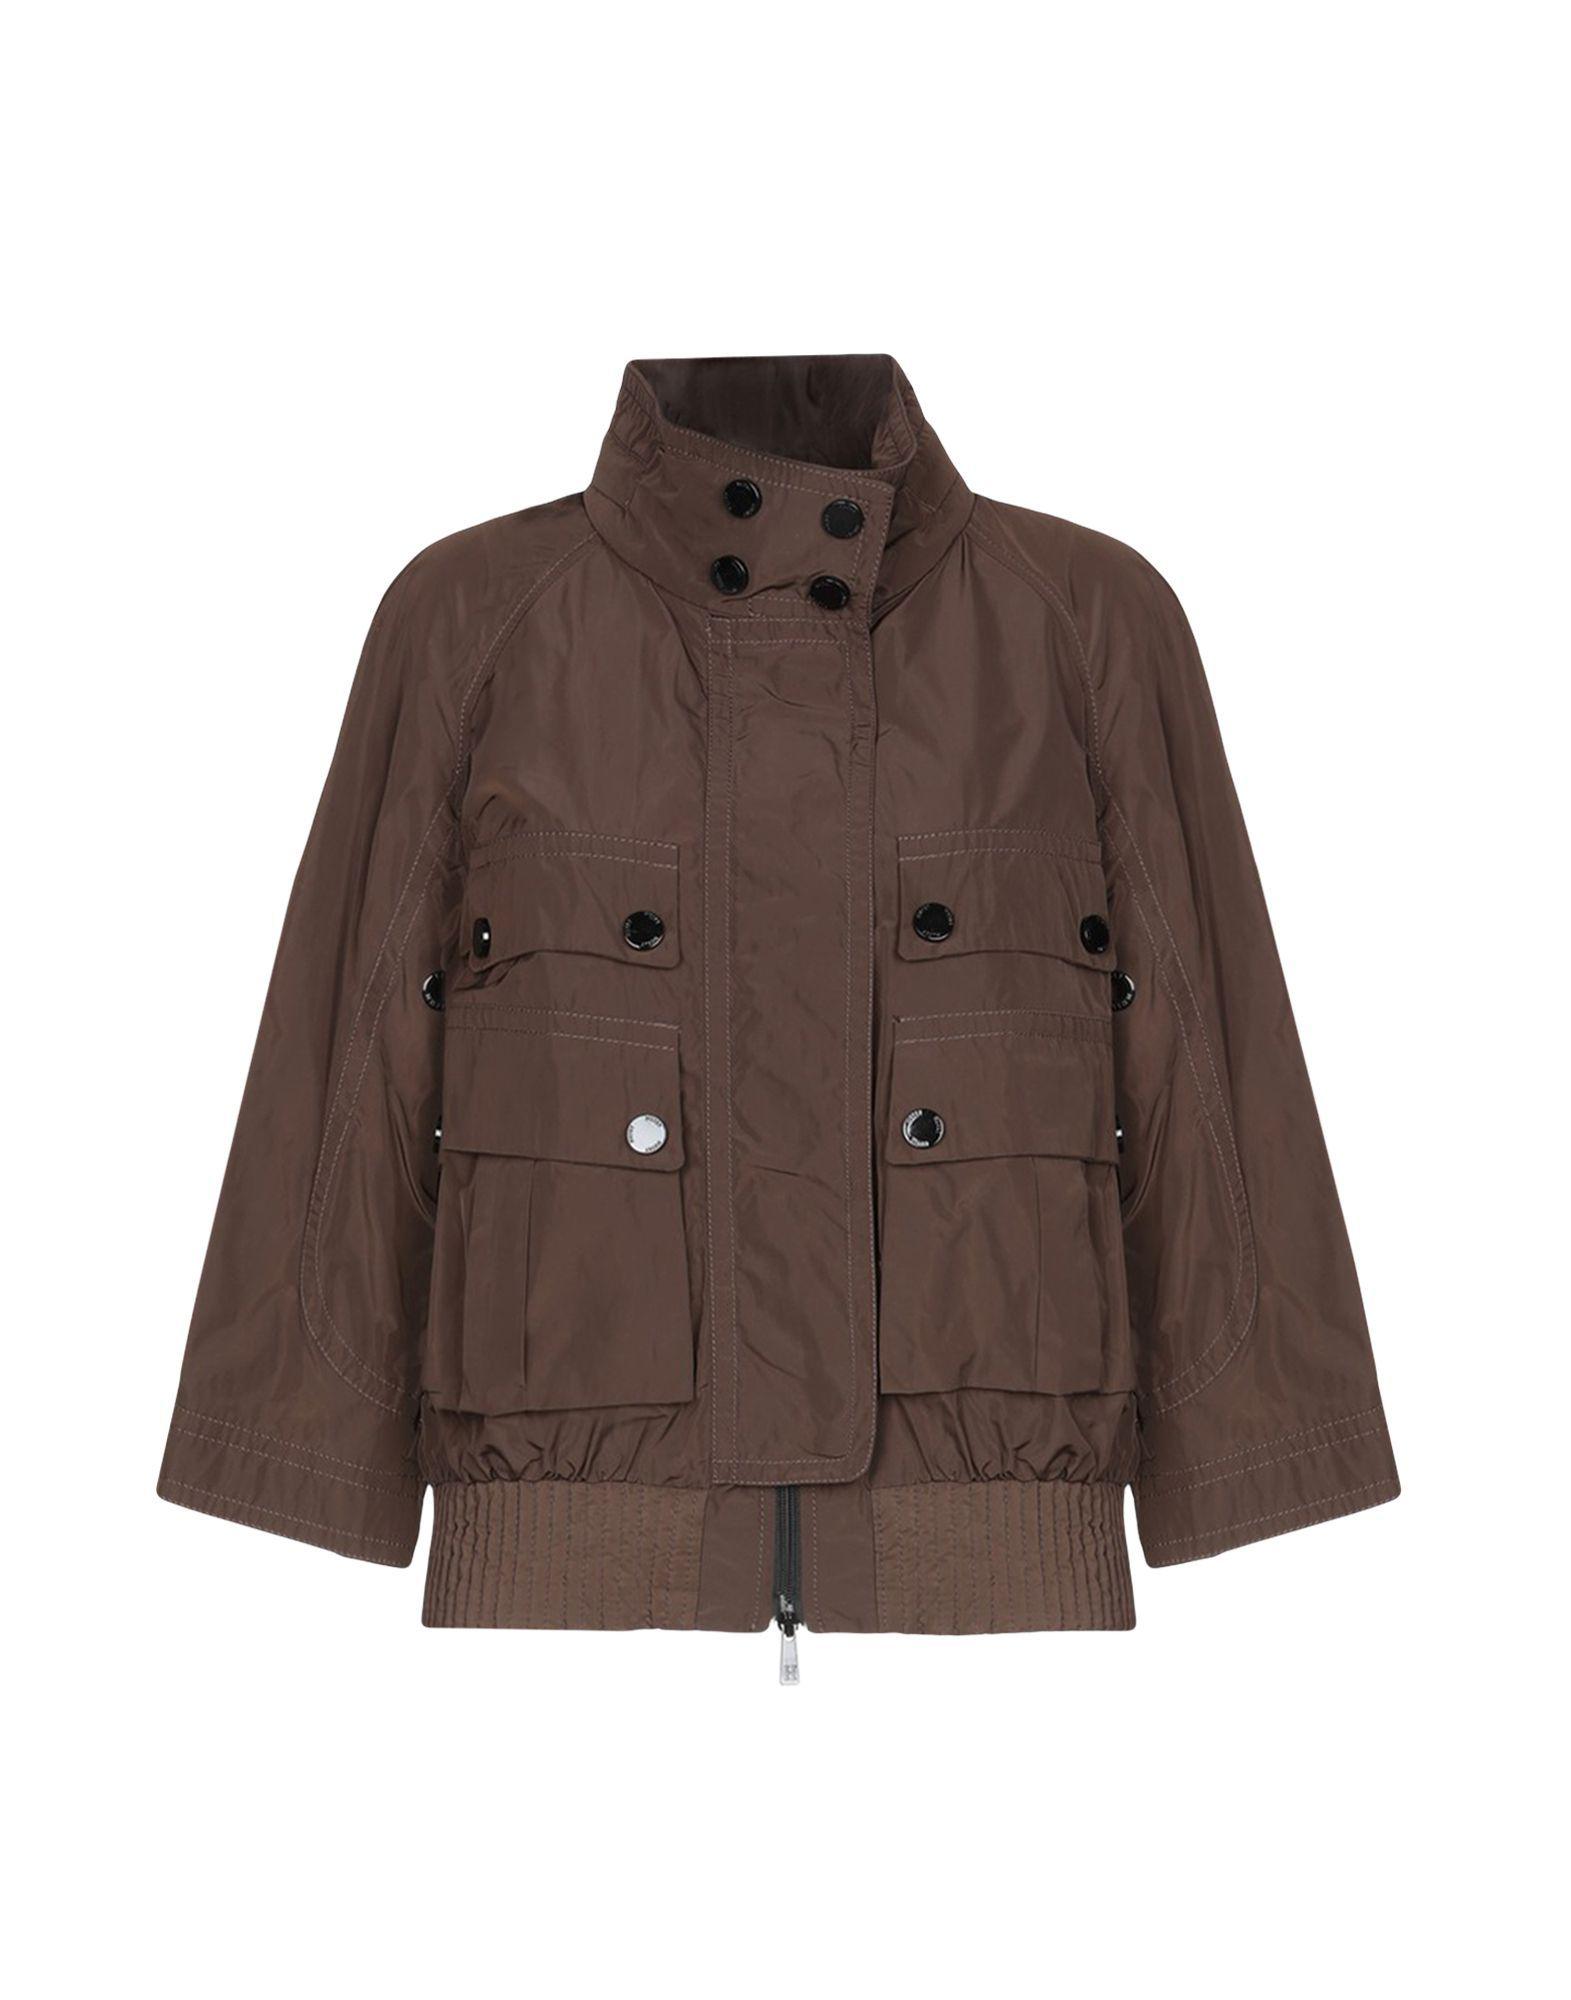 Husky Dark Brown Jacket